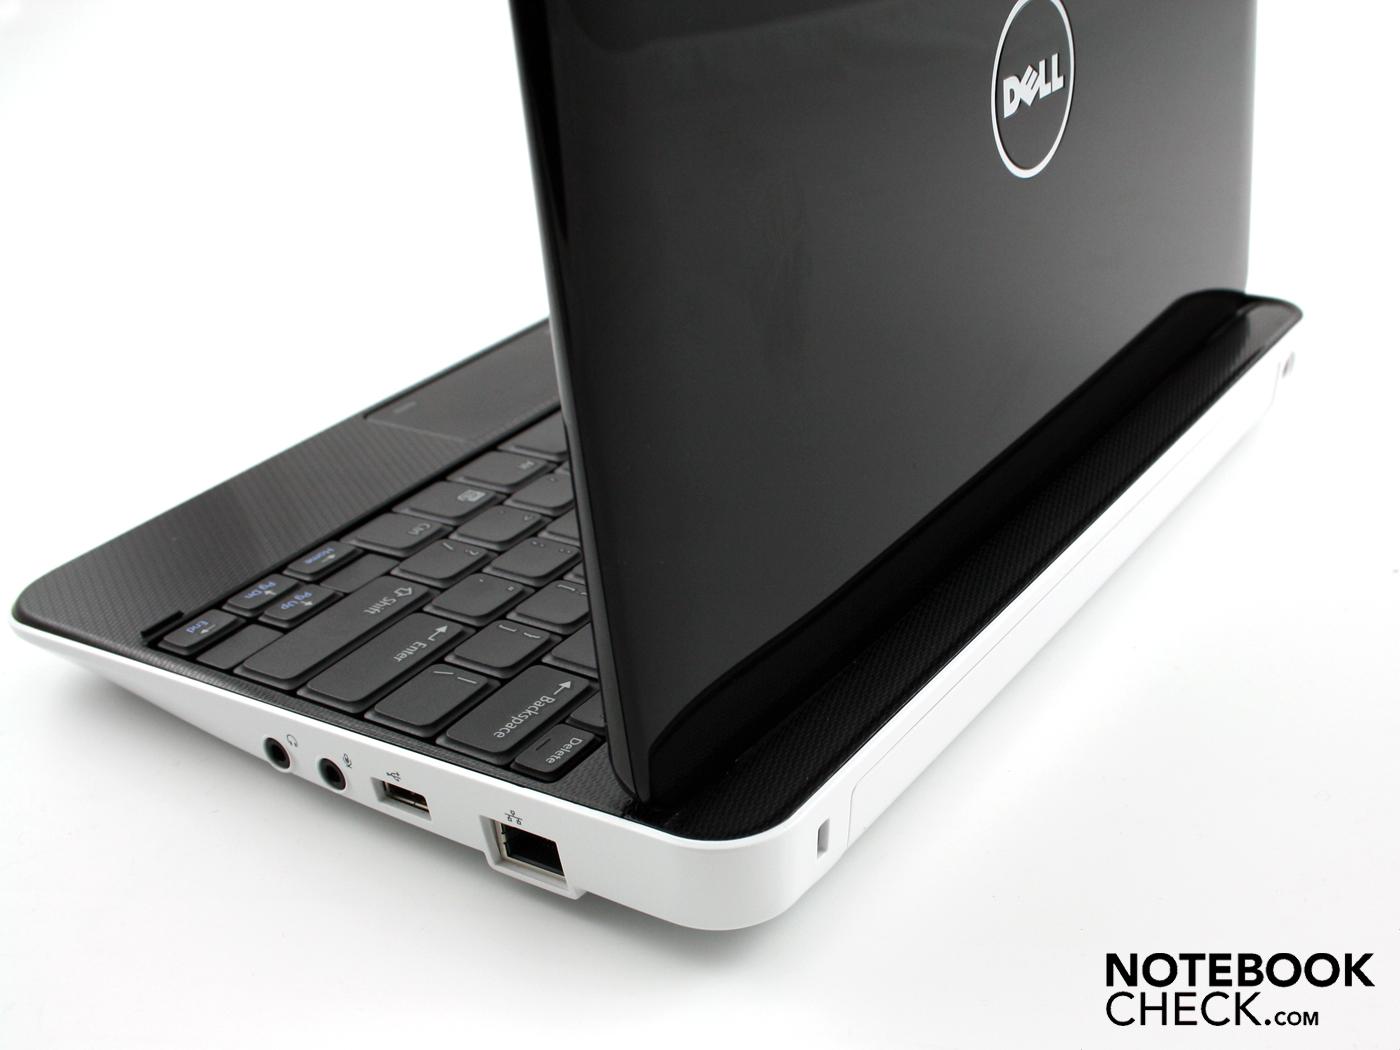 Dell Mini 1012 Review | jRin.net